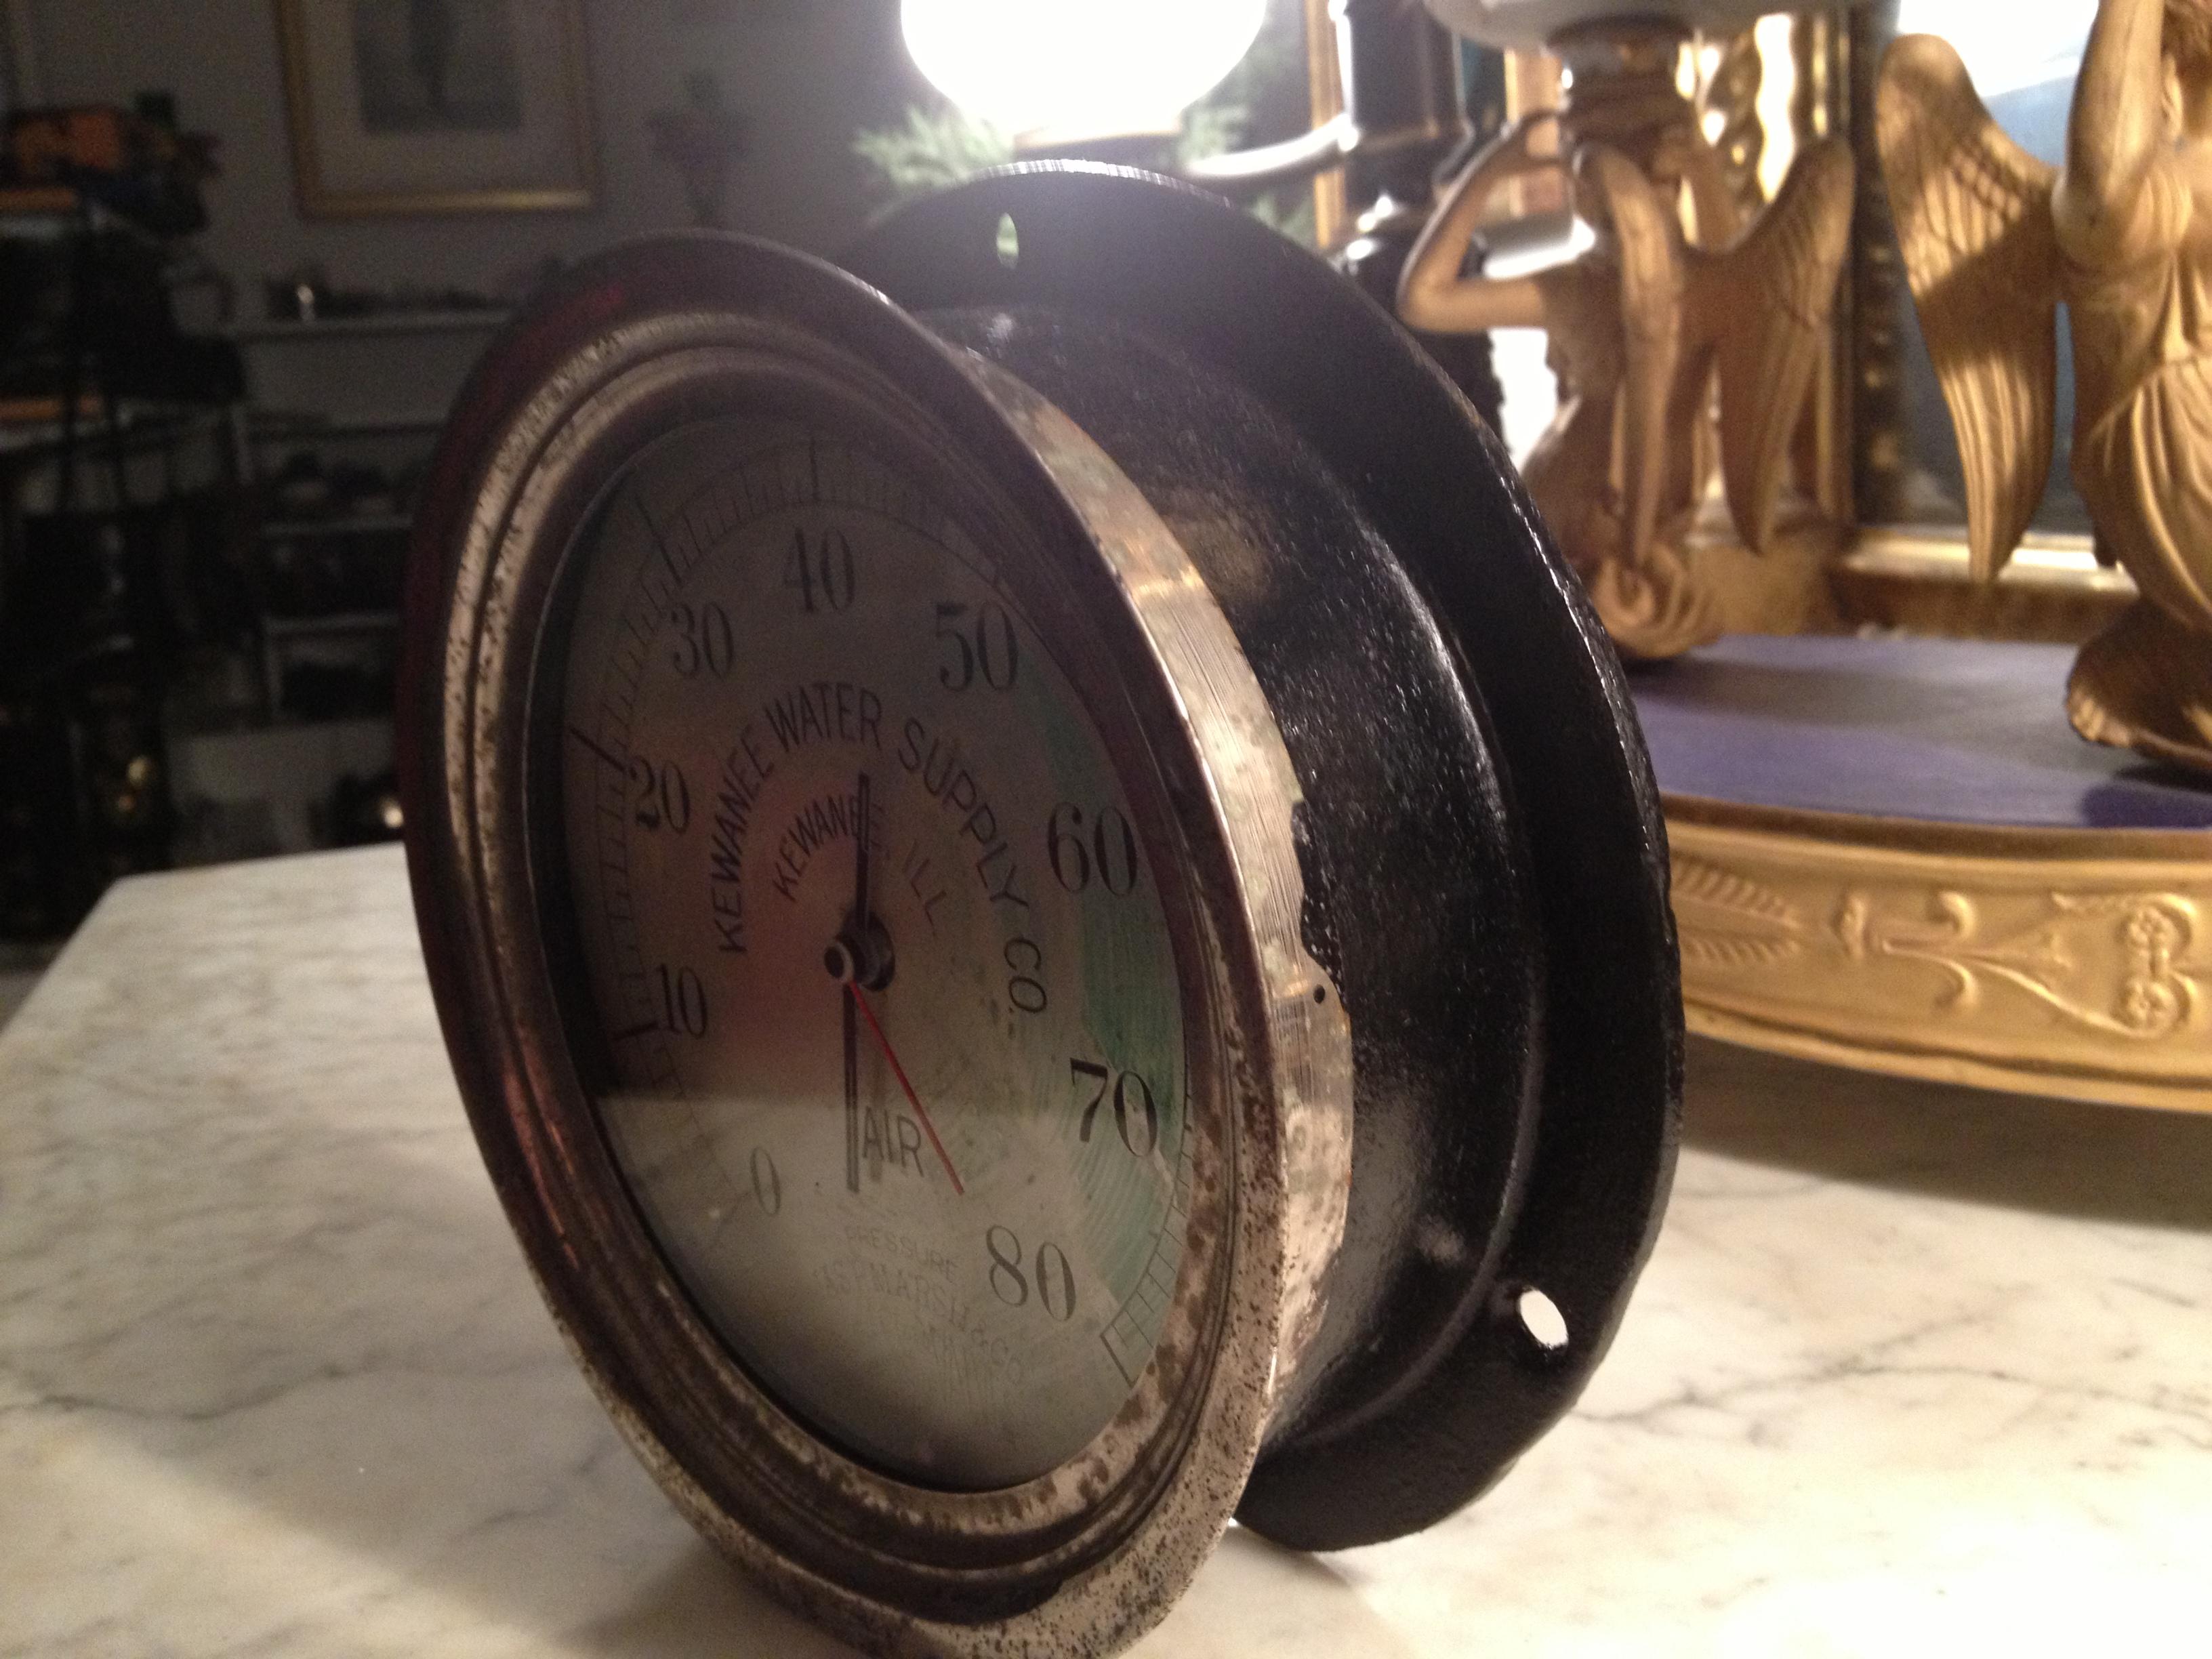 i_gearz_steampunk_hand_made_steam_pressure_gauge_clock_6_battery_op_antique_vintage_clocks_2.JPG